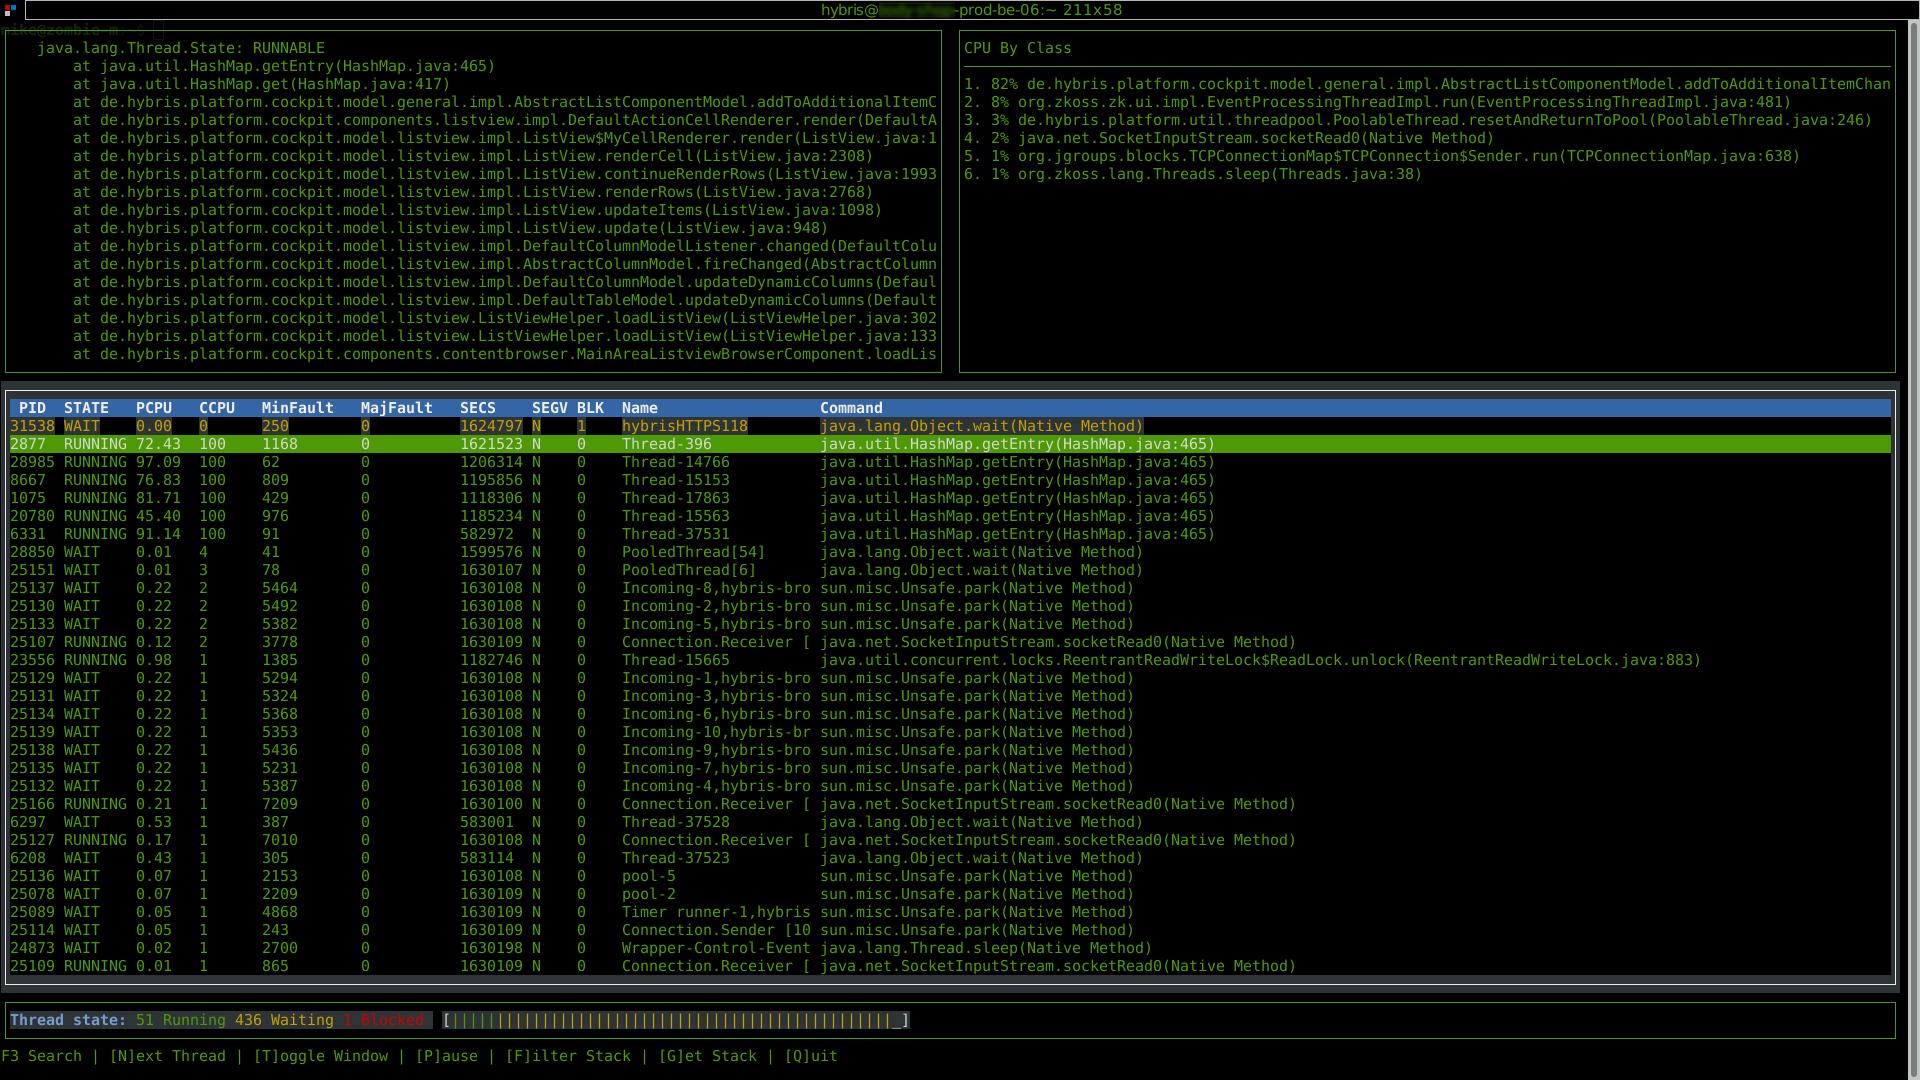 GitHub - mikejonesey/jtop: jtop is a free (GPL) ncurses-based java